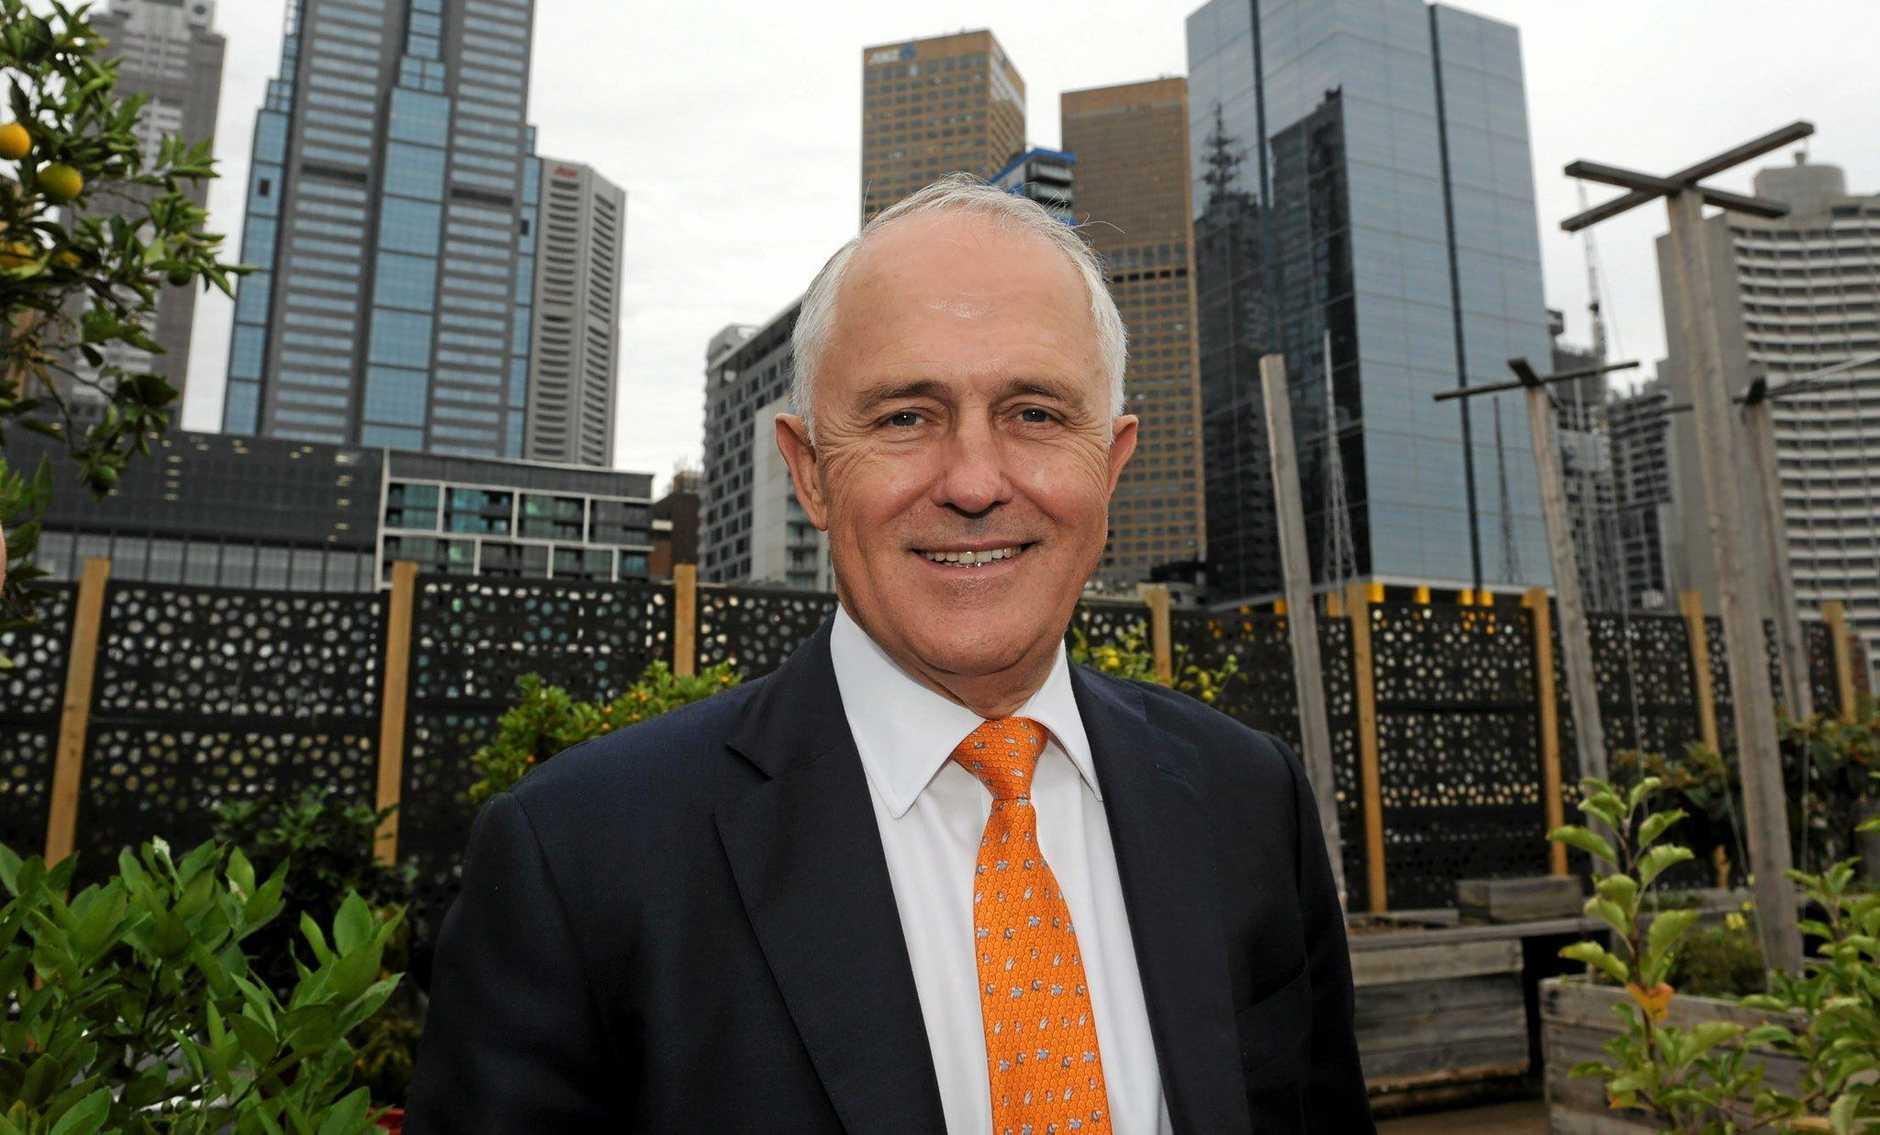 BIG PLANS: Prime Minister Malcolm Turnbull.